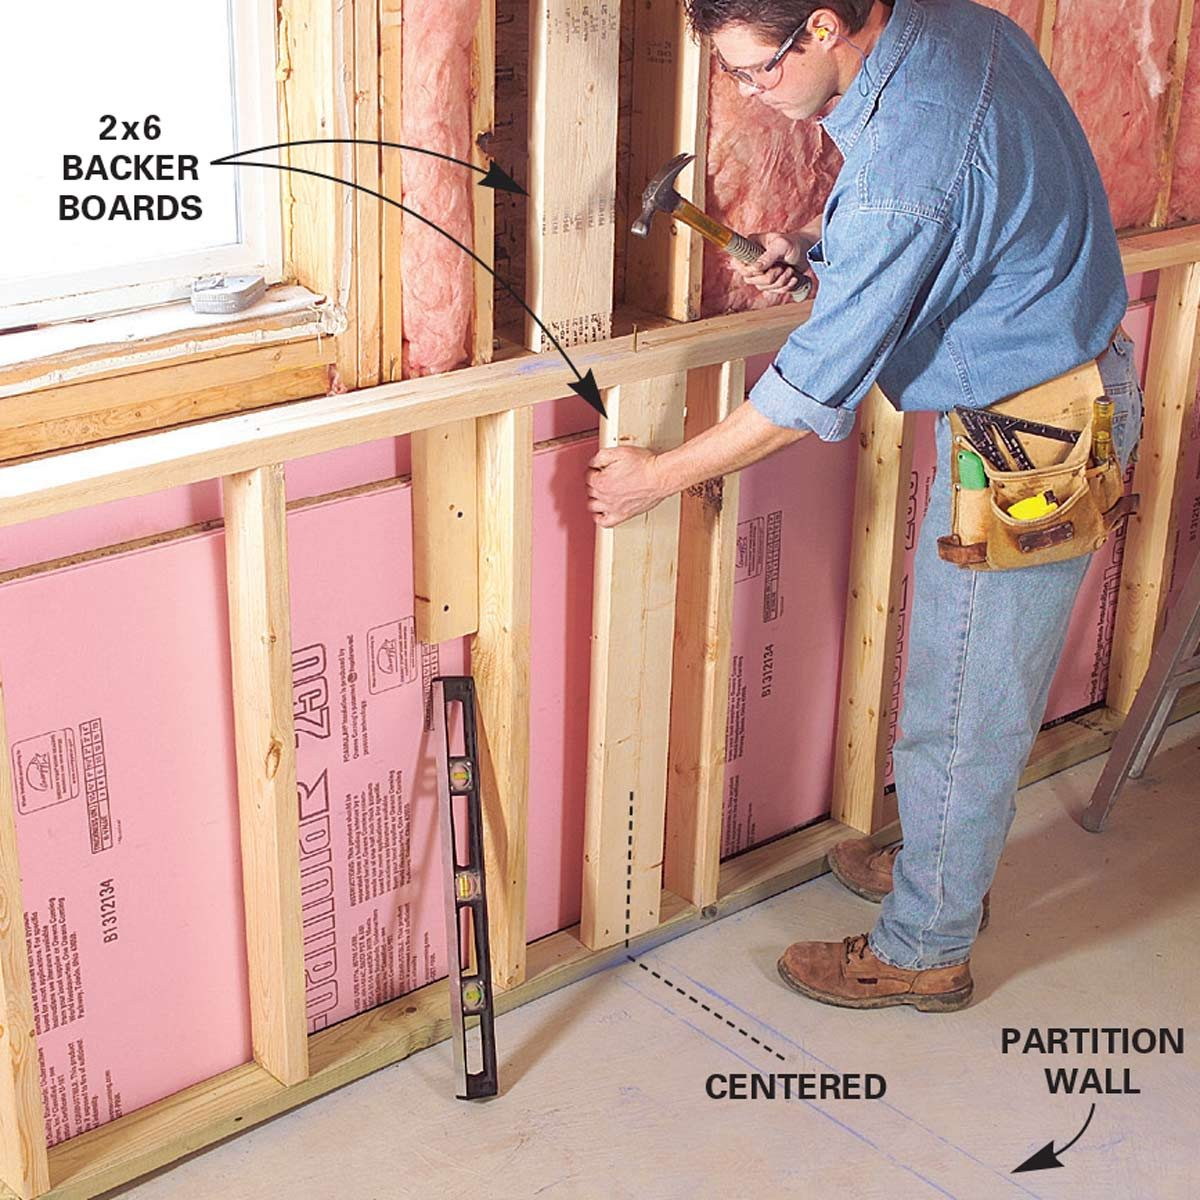 Finishing a Basement - Install Backer Boards